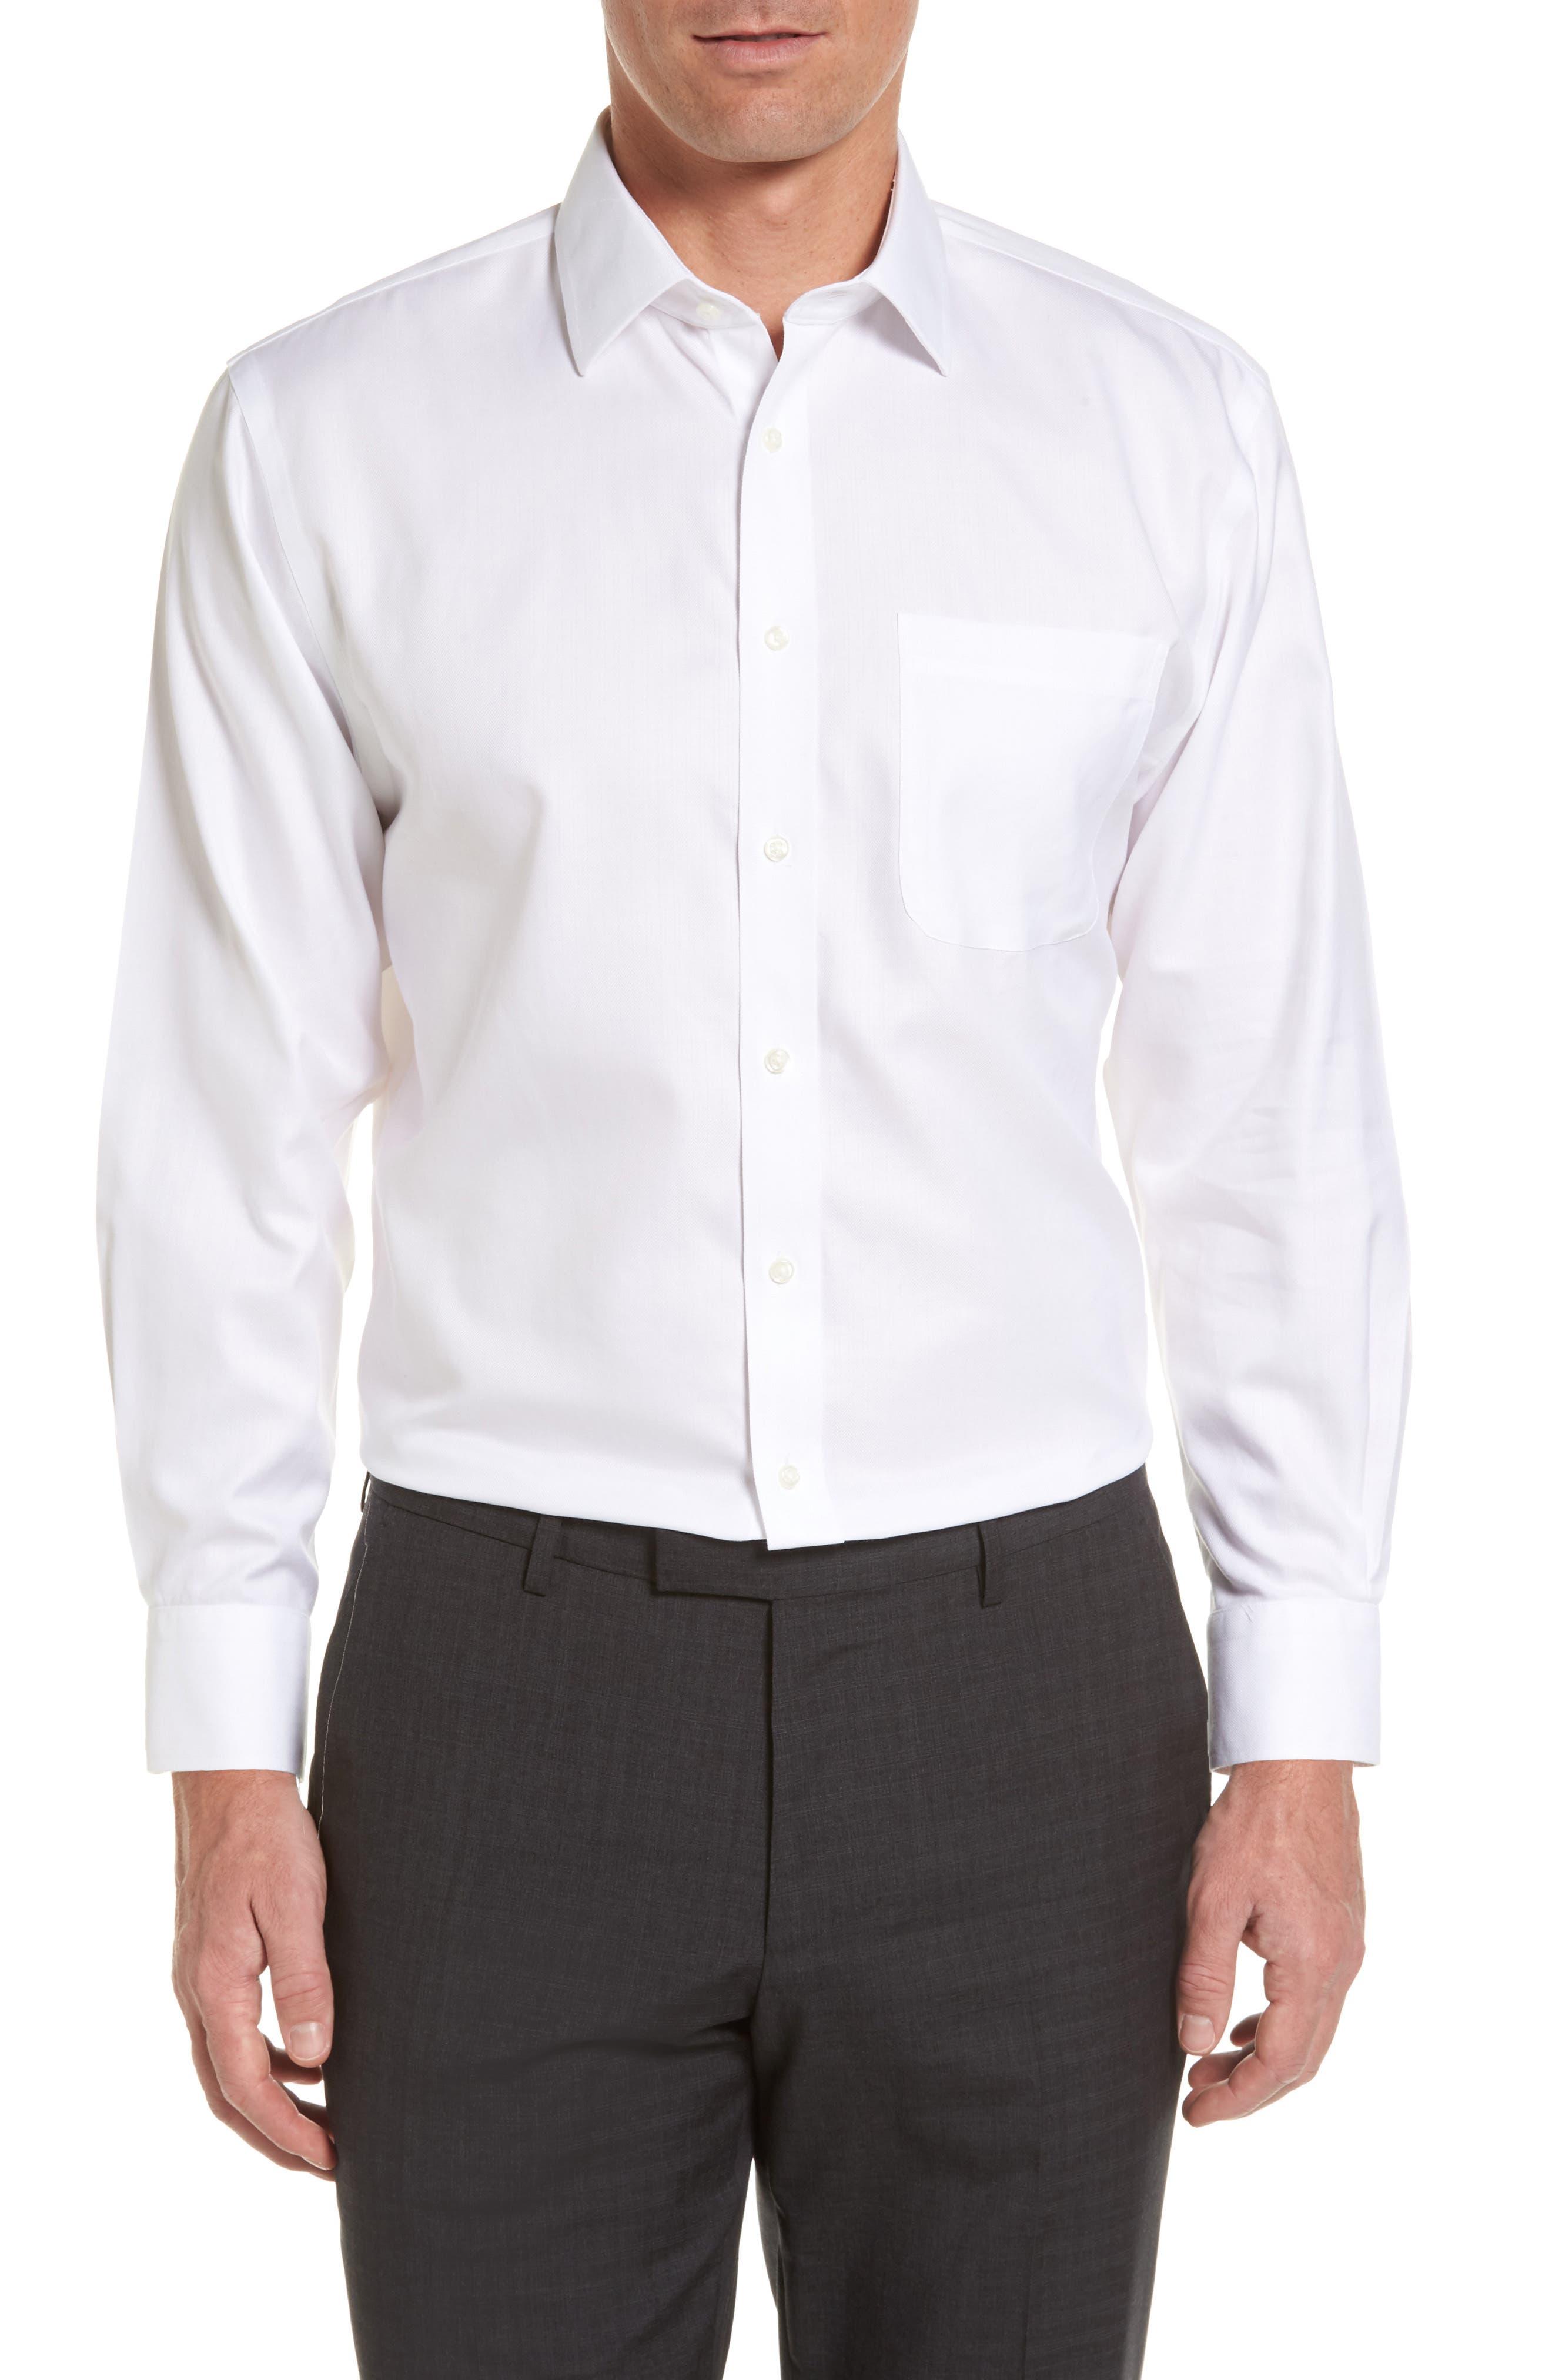 Nordstrom Shop Smartcare(TM) Traditional Fit Herringbone Dress Shirt